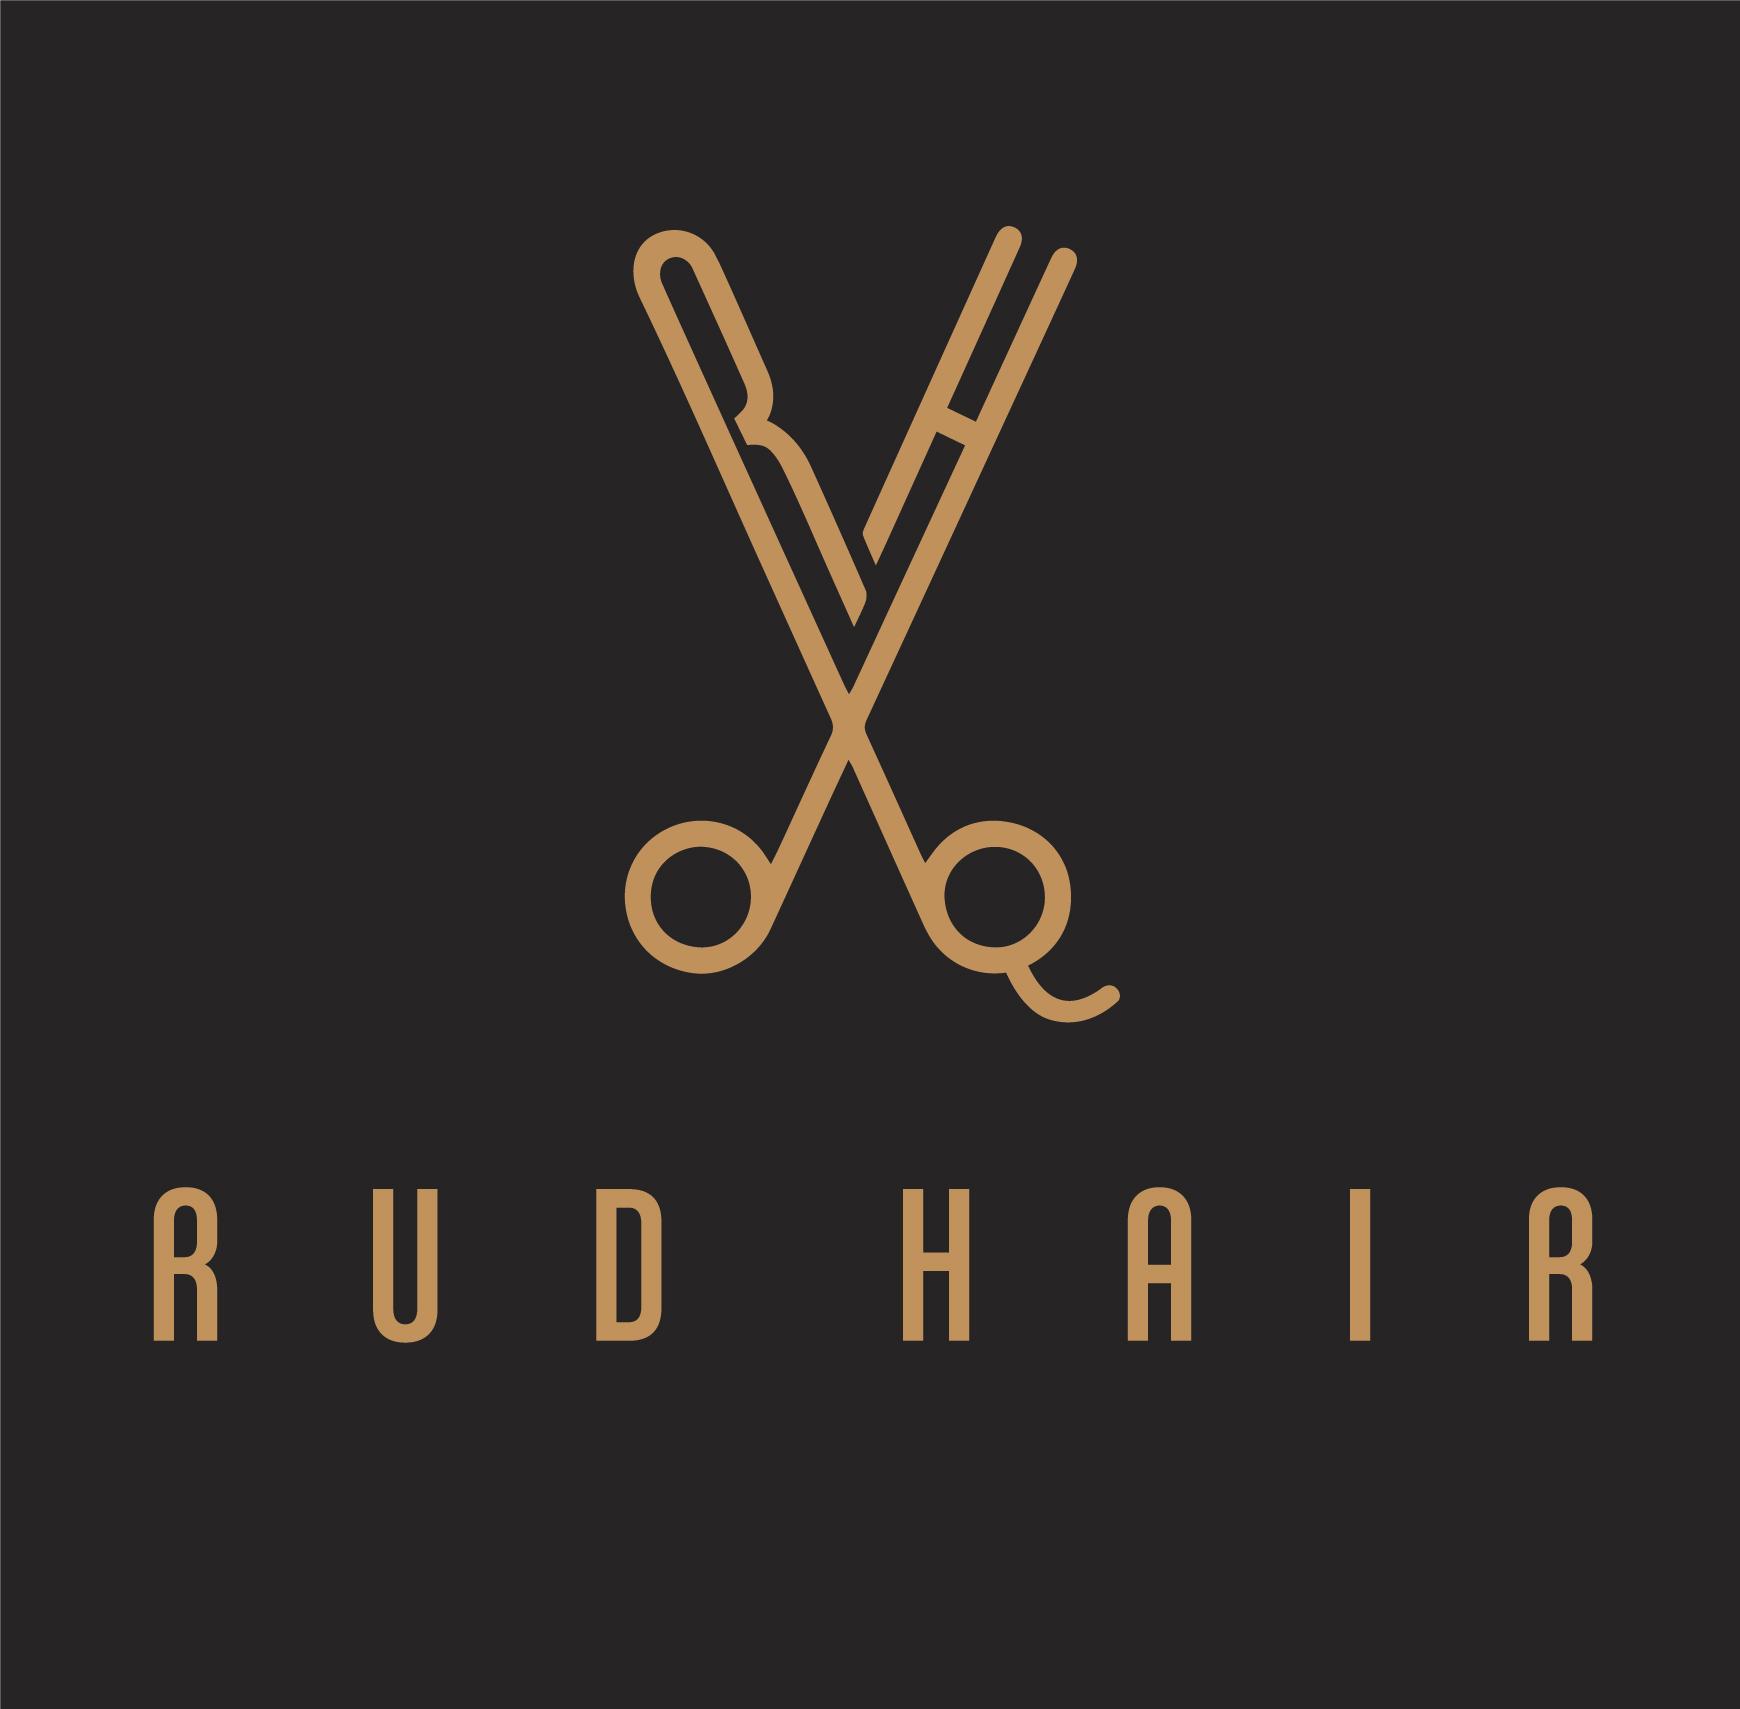 hairdresser offers Rud Hair